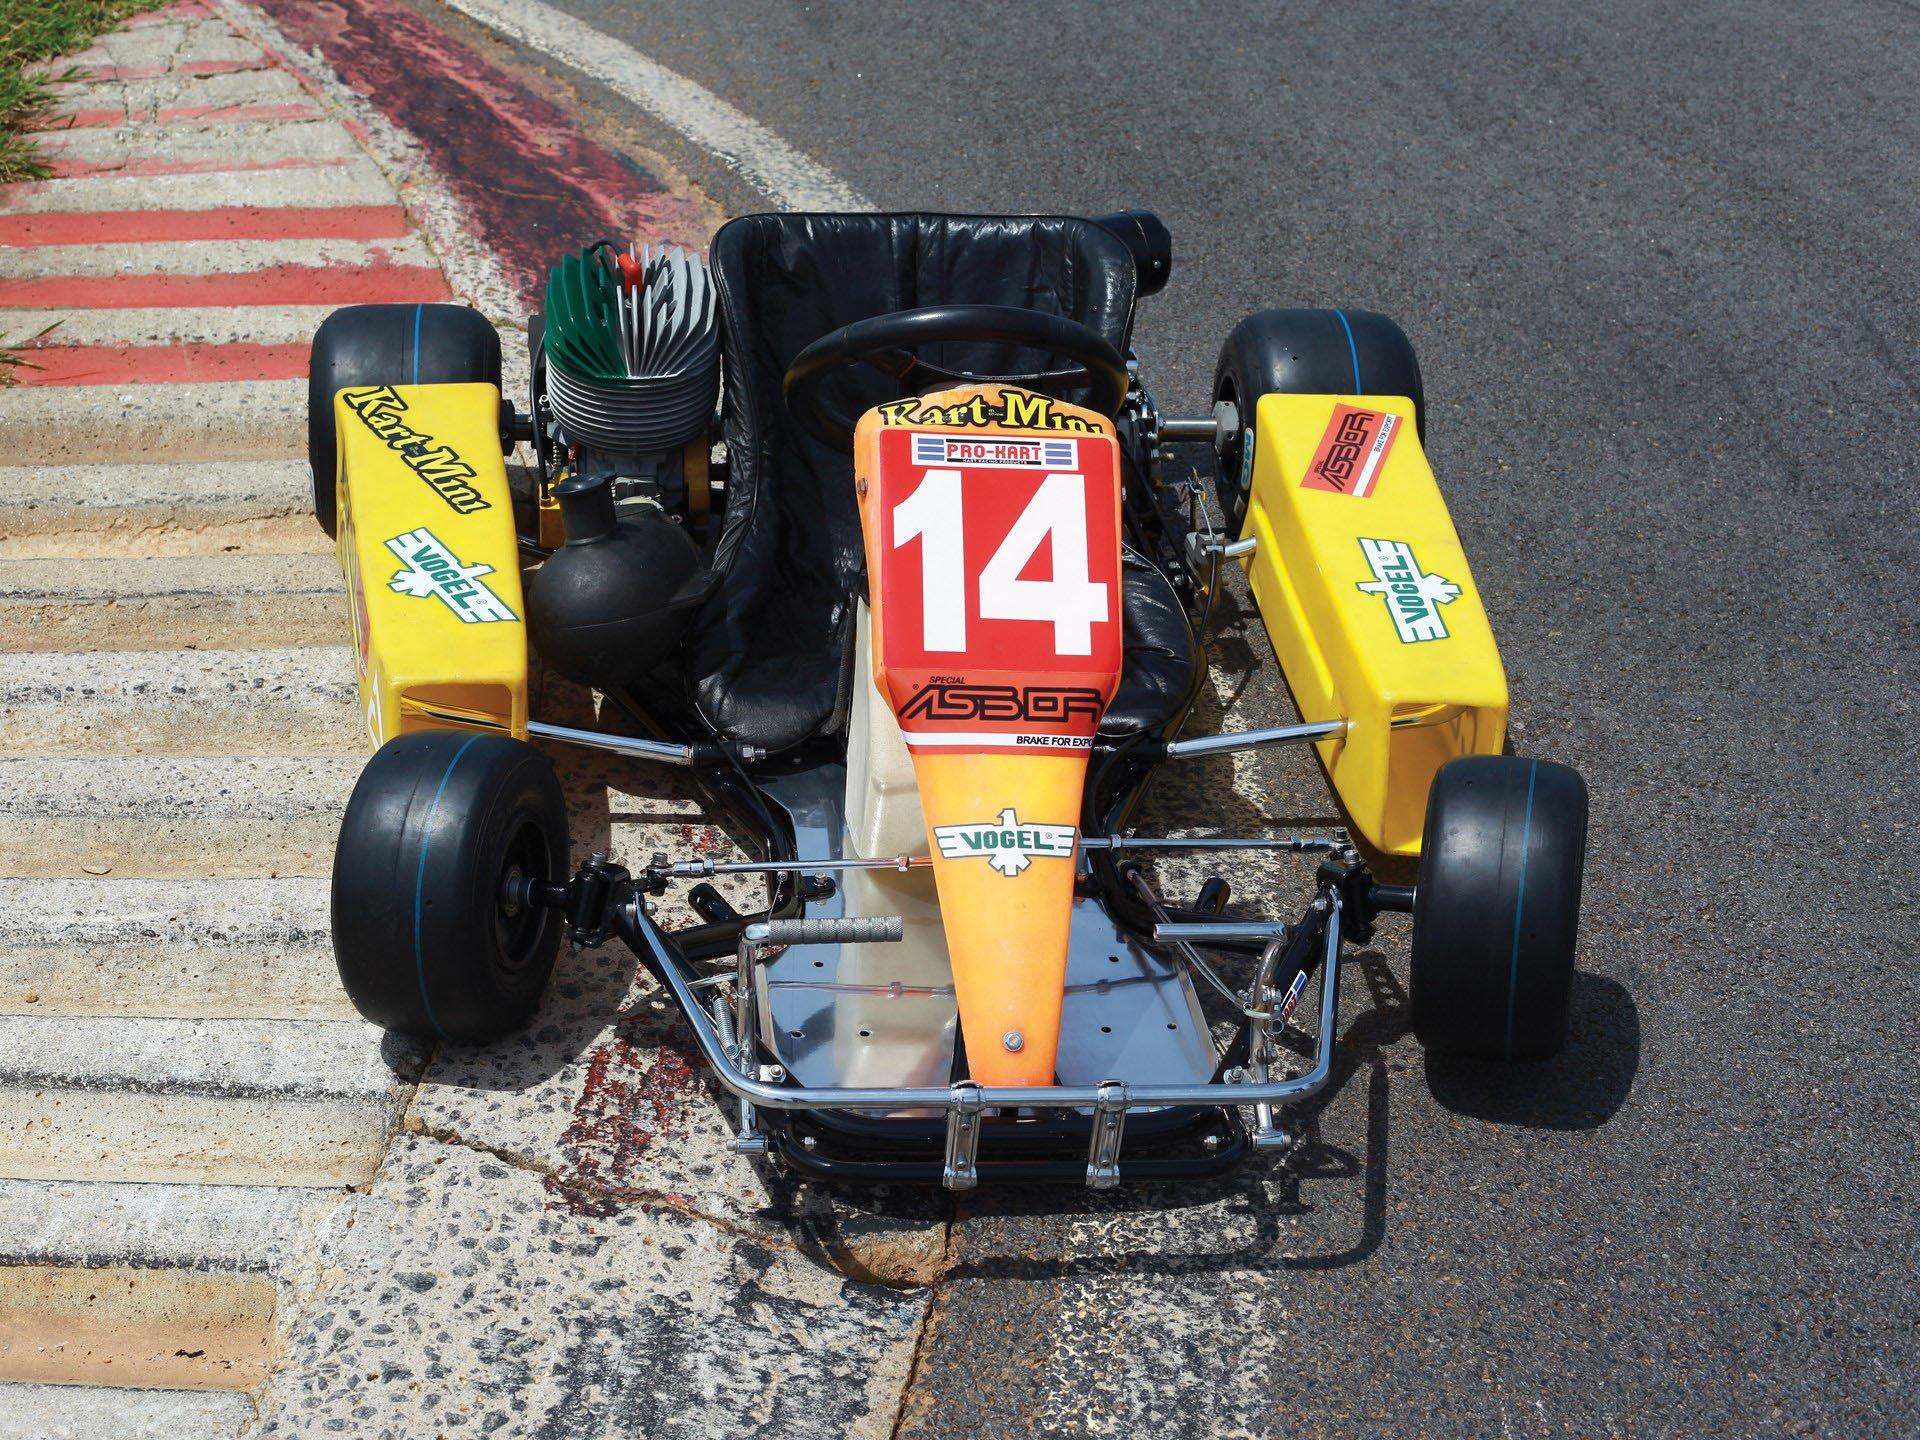 Last Kart Ayrton Senna 4